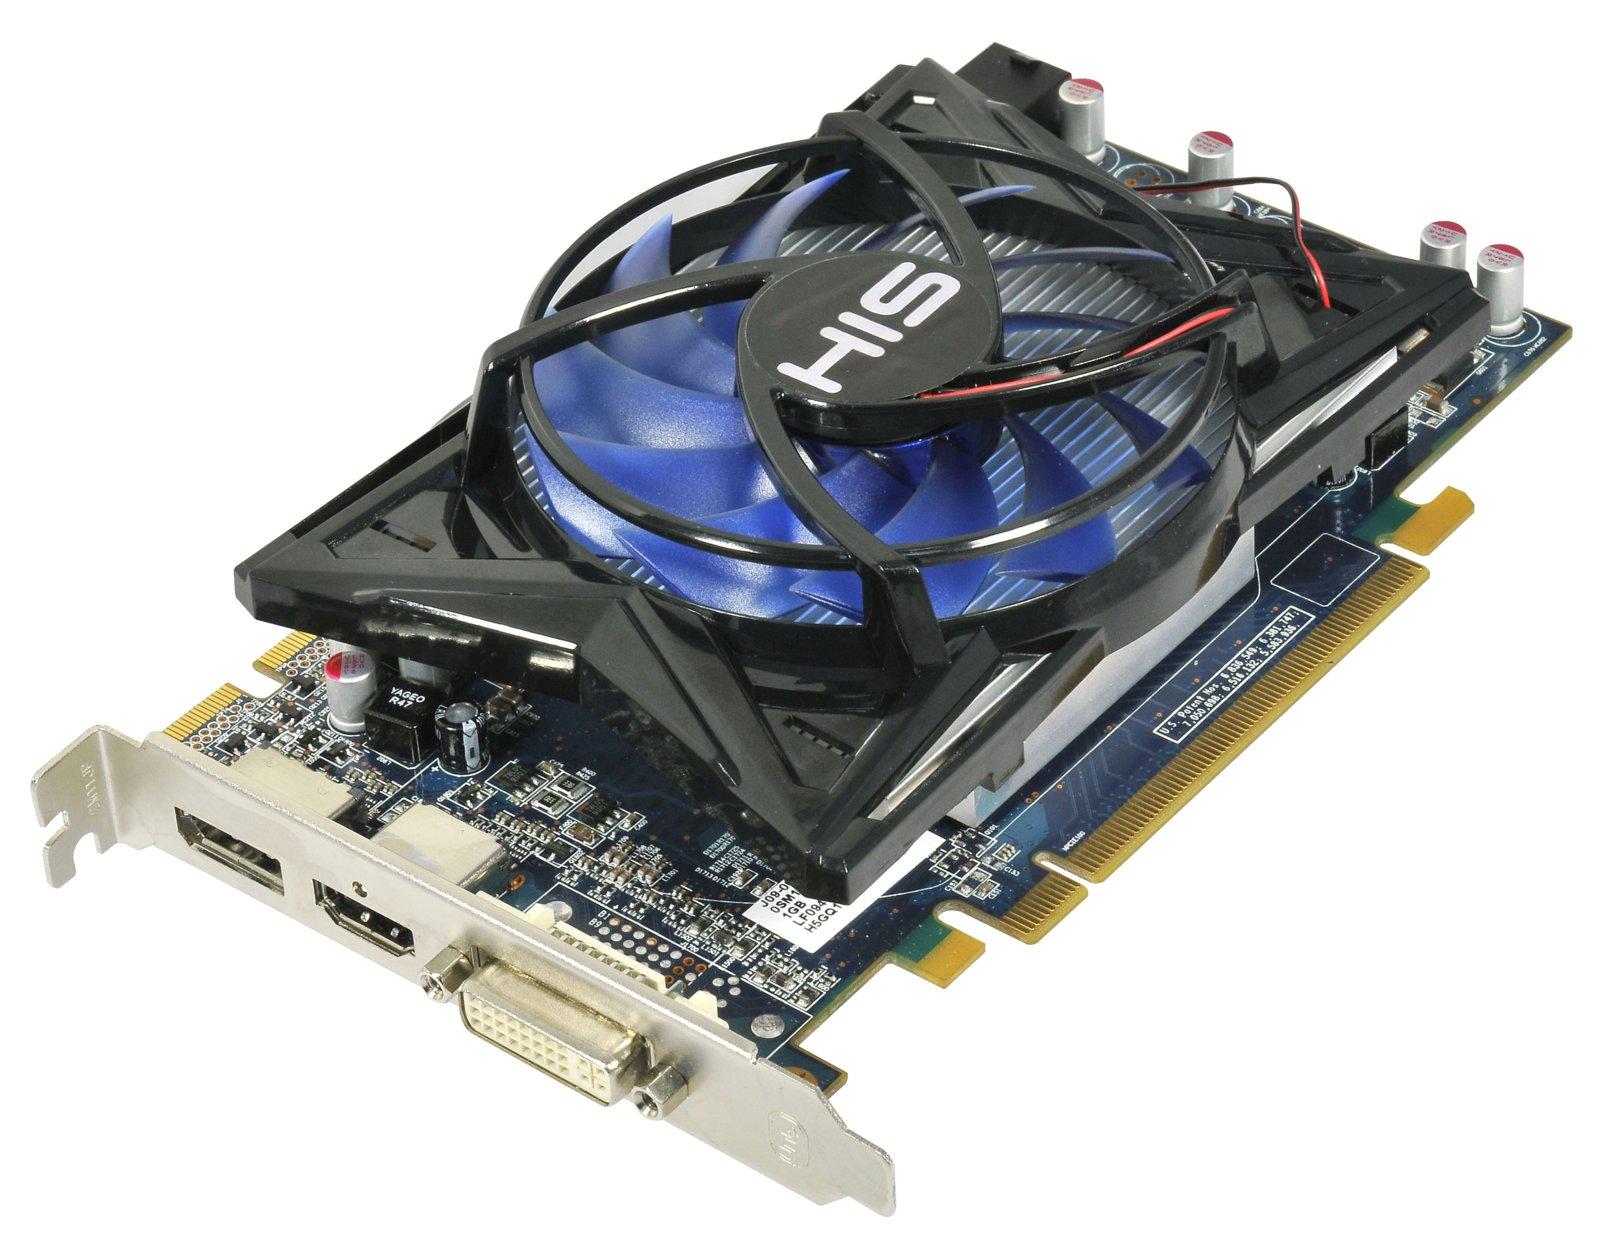 AMD/ATI Mobility Radeon HD 5000 Series drivers for Windows ...